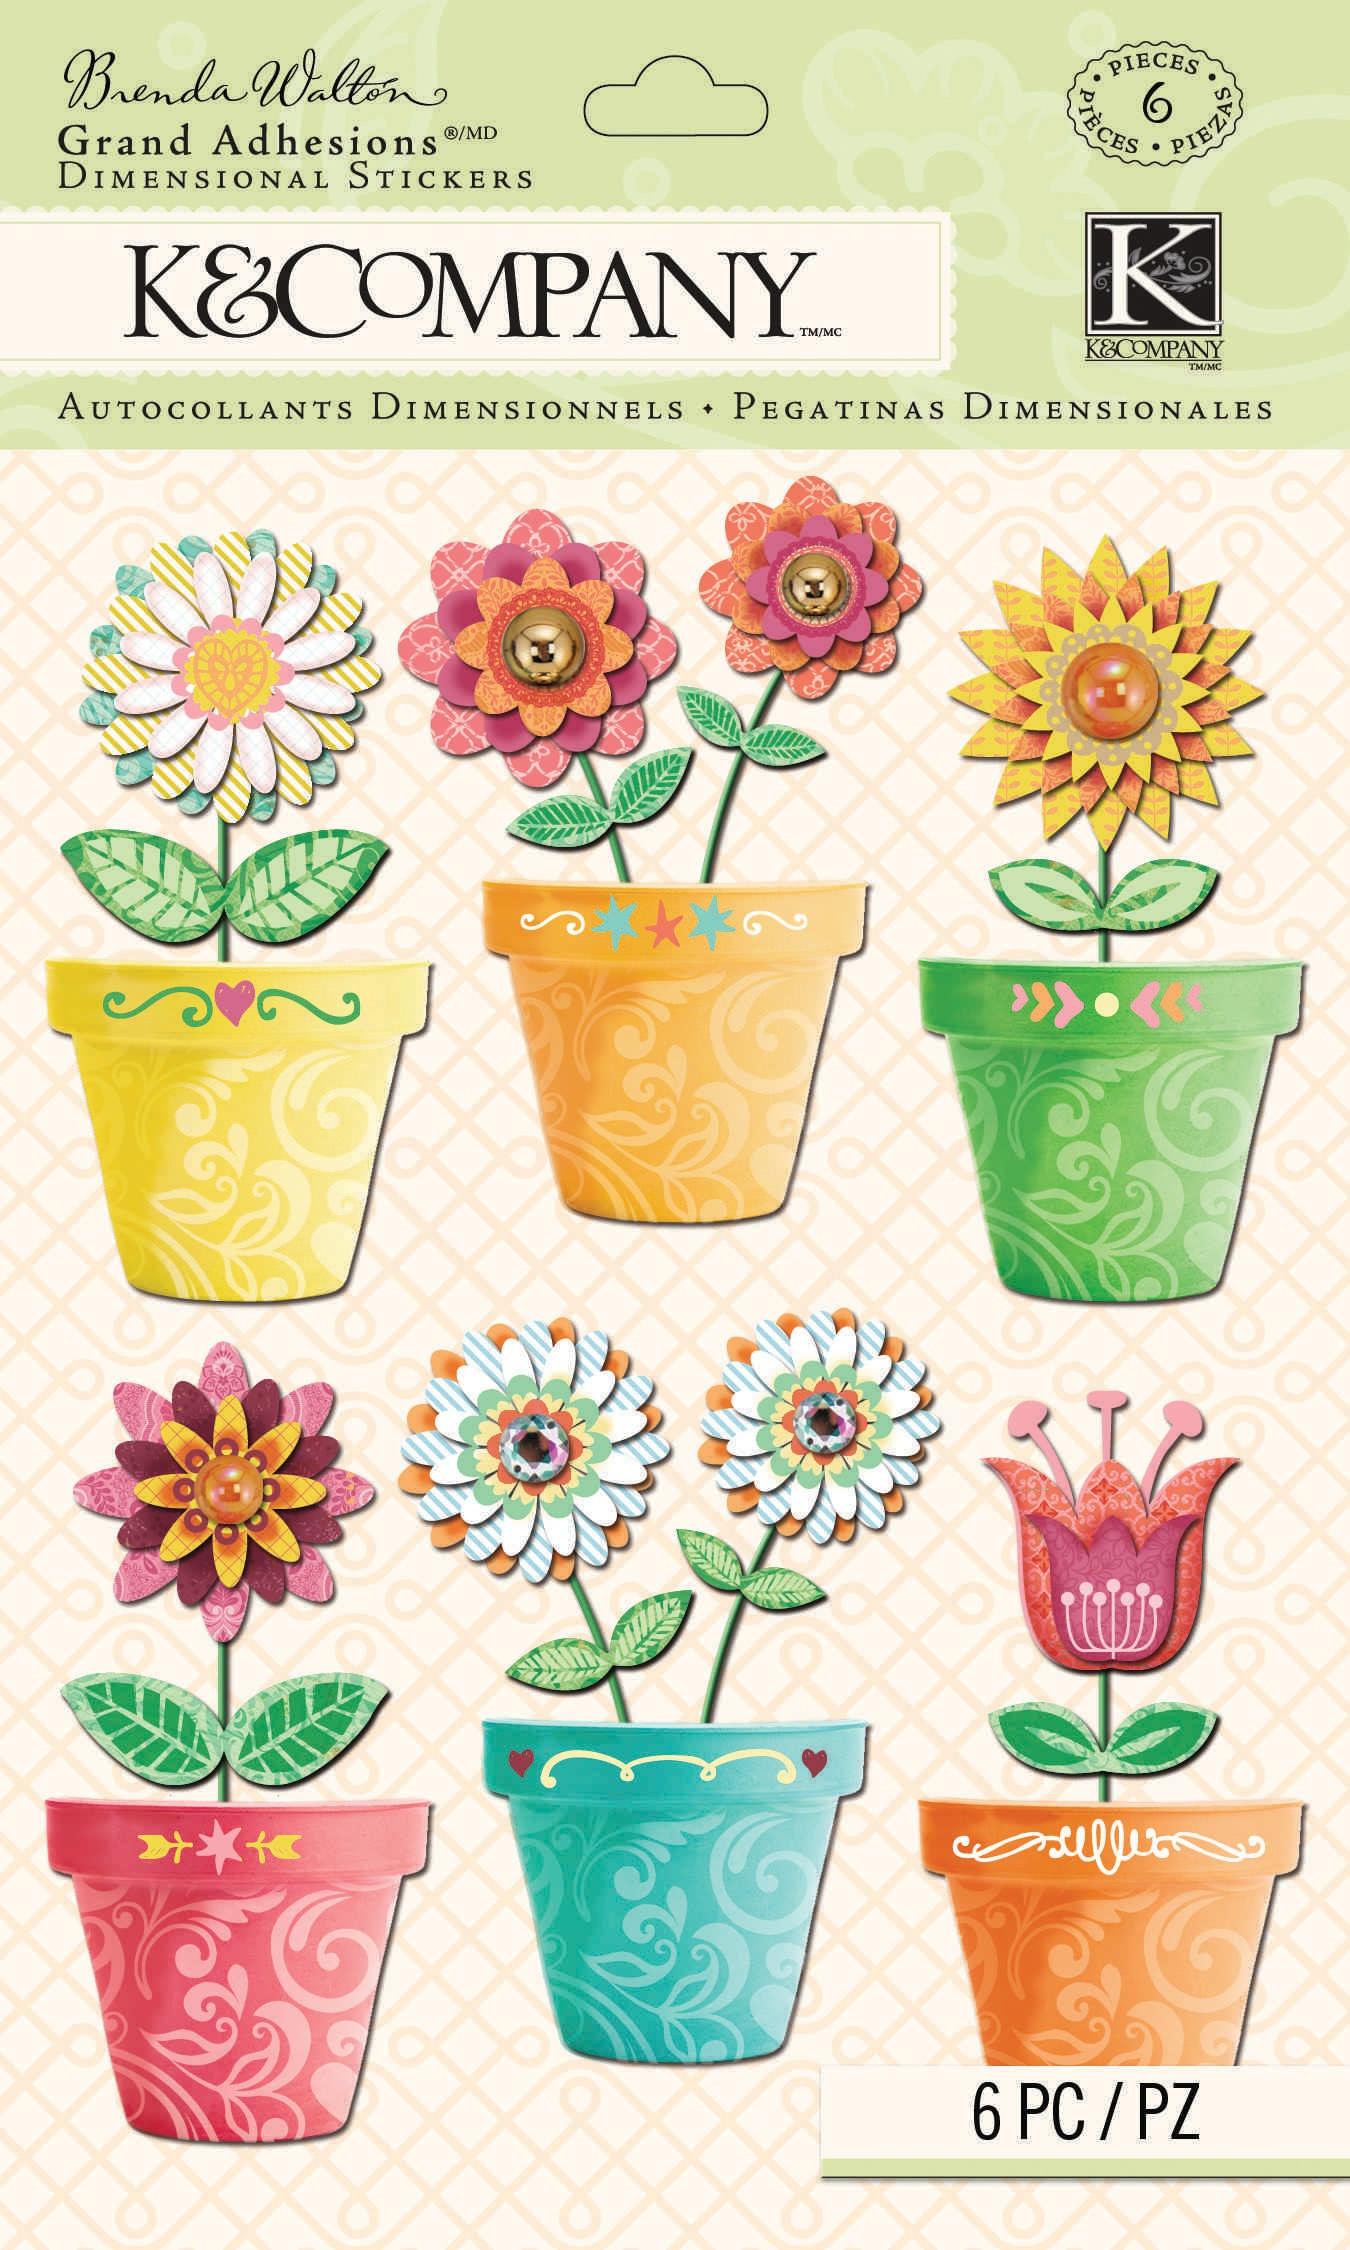 Brenda Walton Grand Adhesions Dimensional Stickers 6/Pkg-Flower Pots